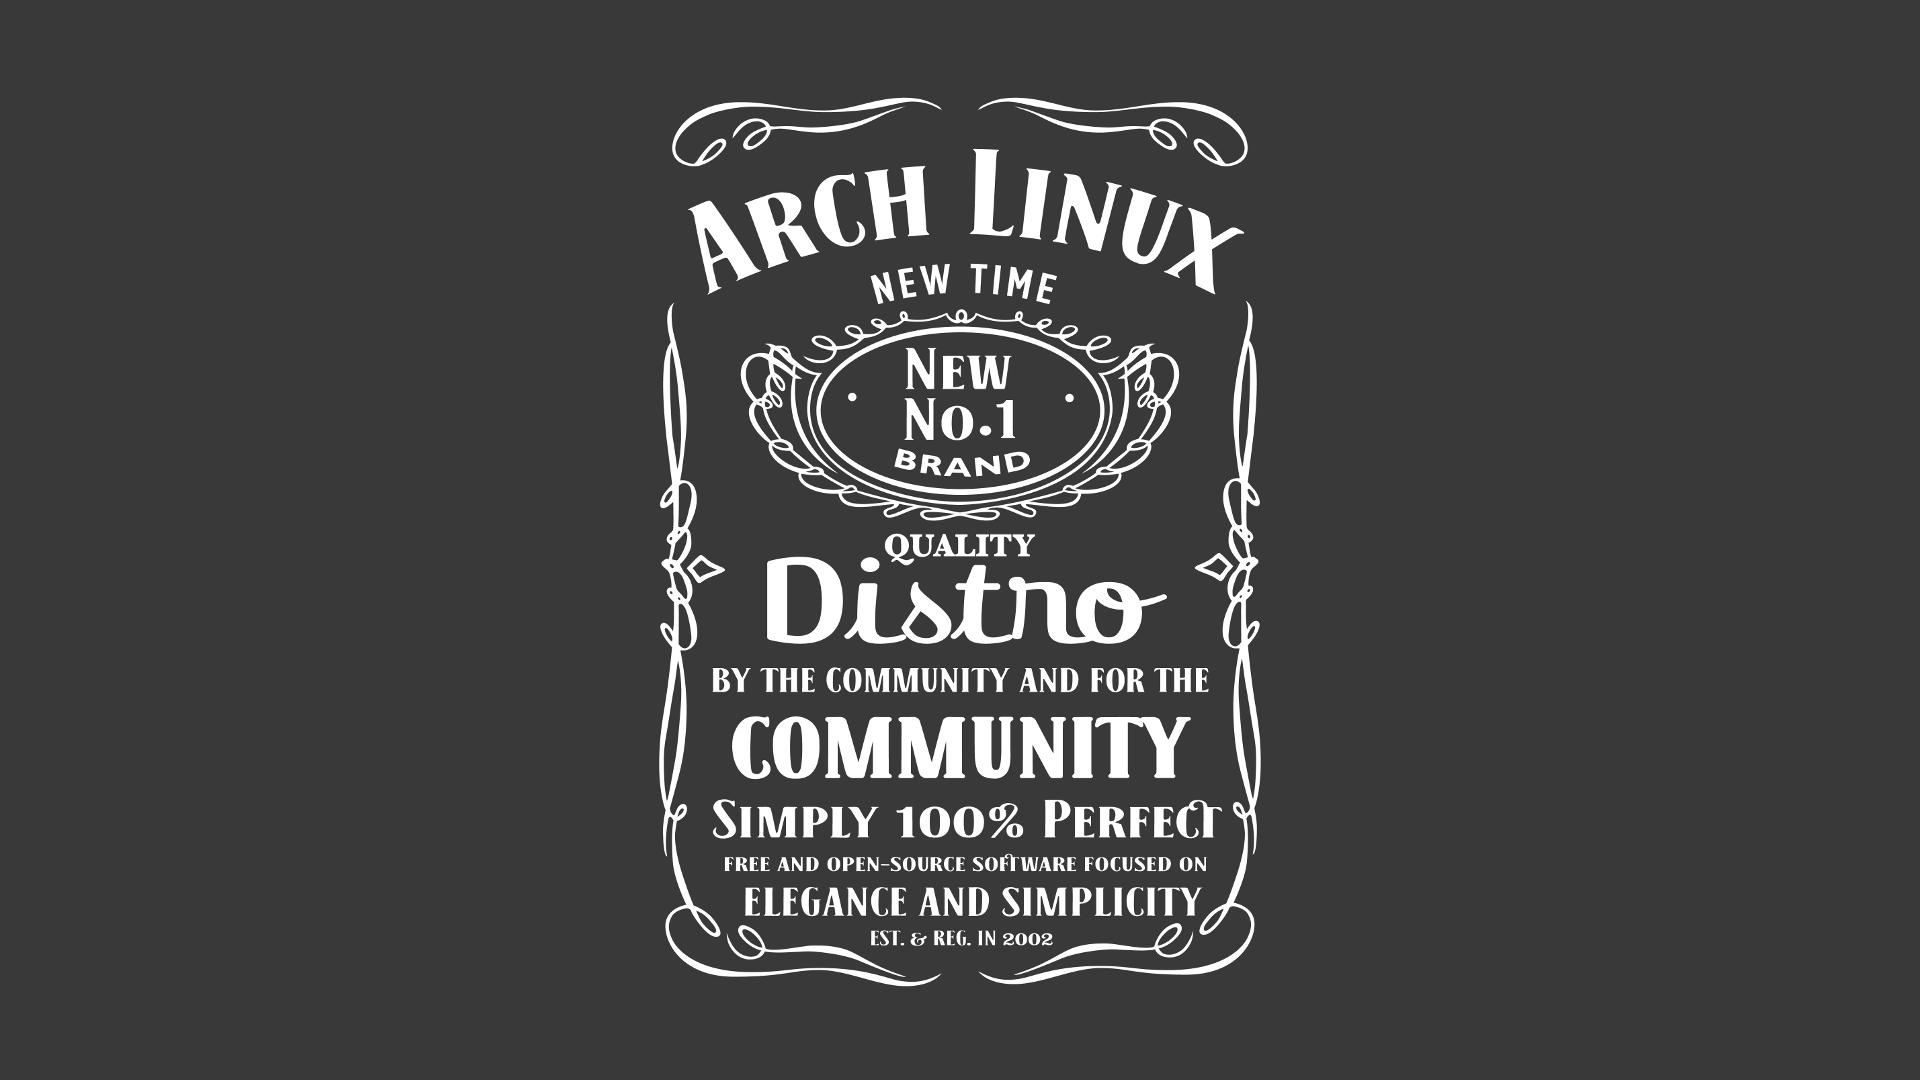 General 1920x1080 Archlinux Linux simple background black background